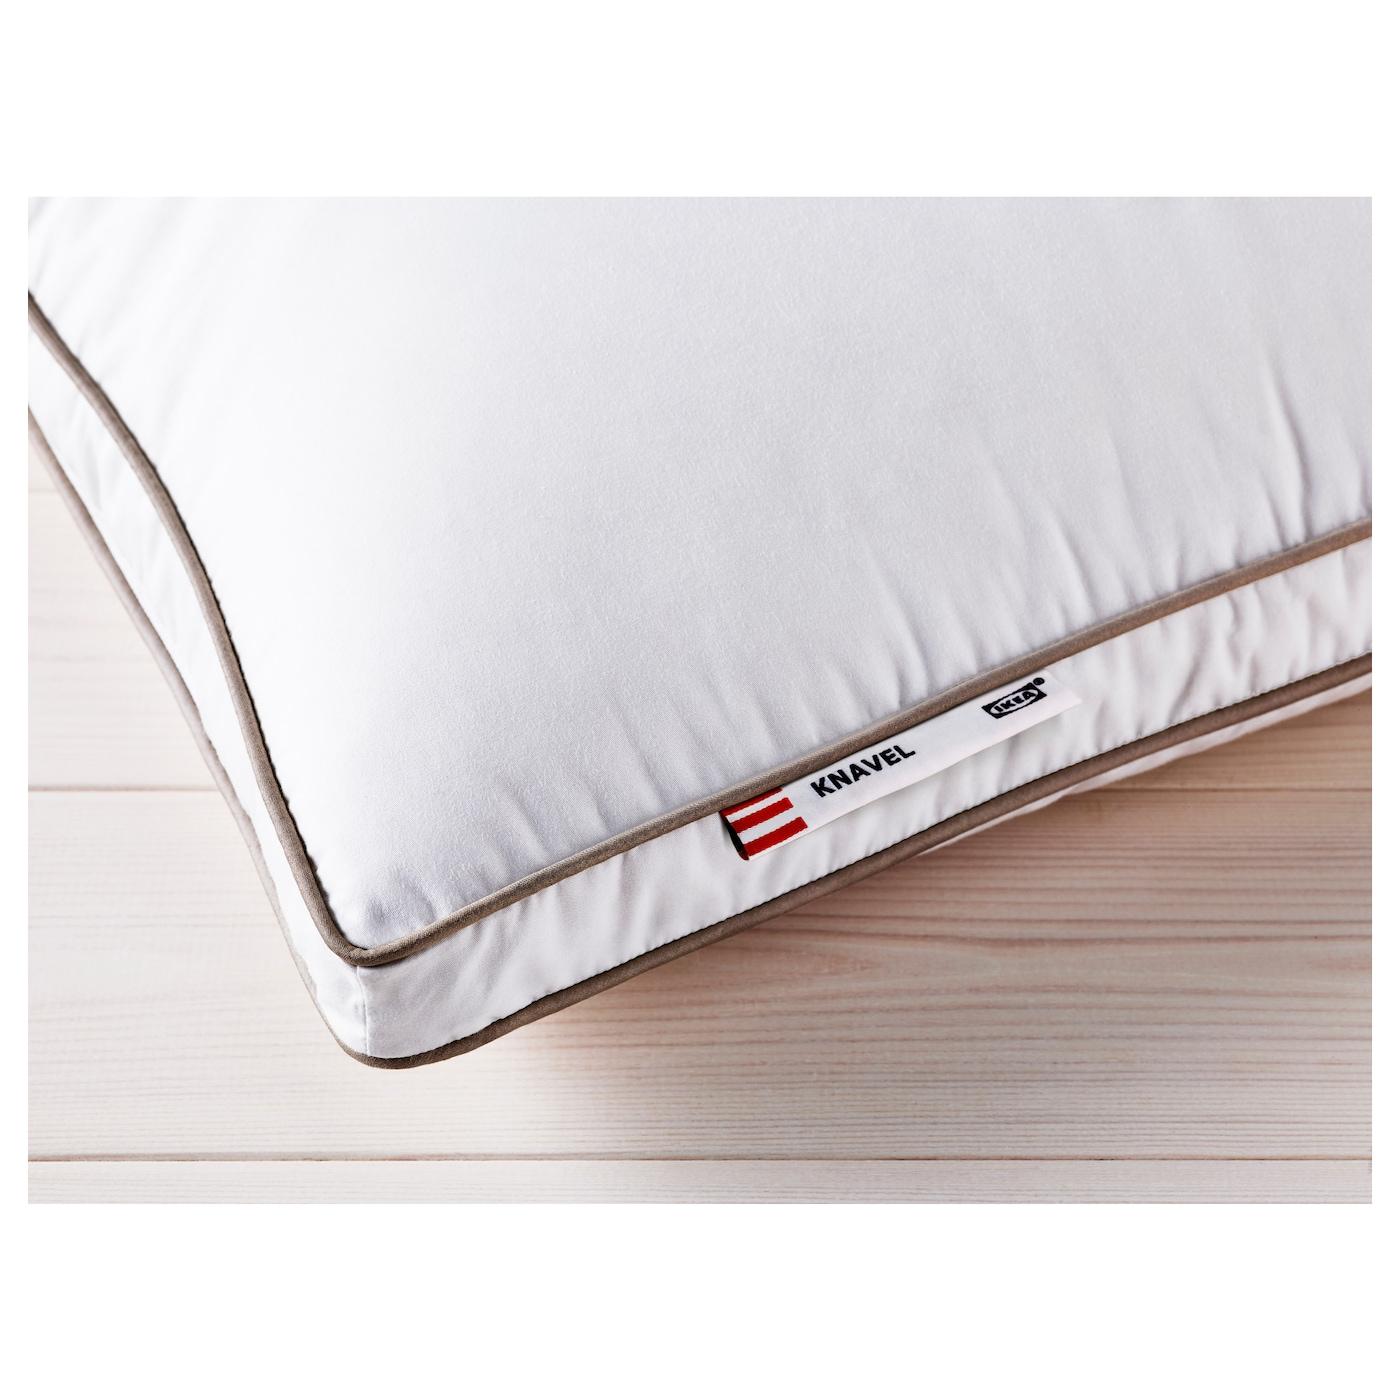 knavel oreiller souple 50x60 cm ikea. Black Bedroom Furniture Sets. Home Design Ideas